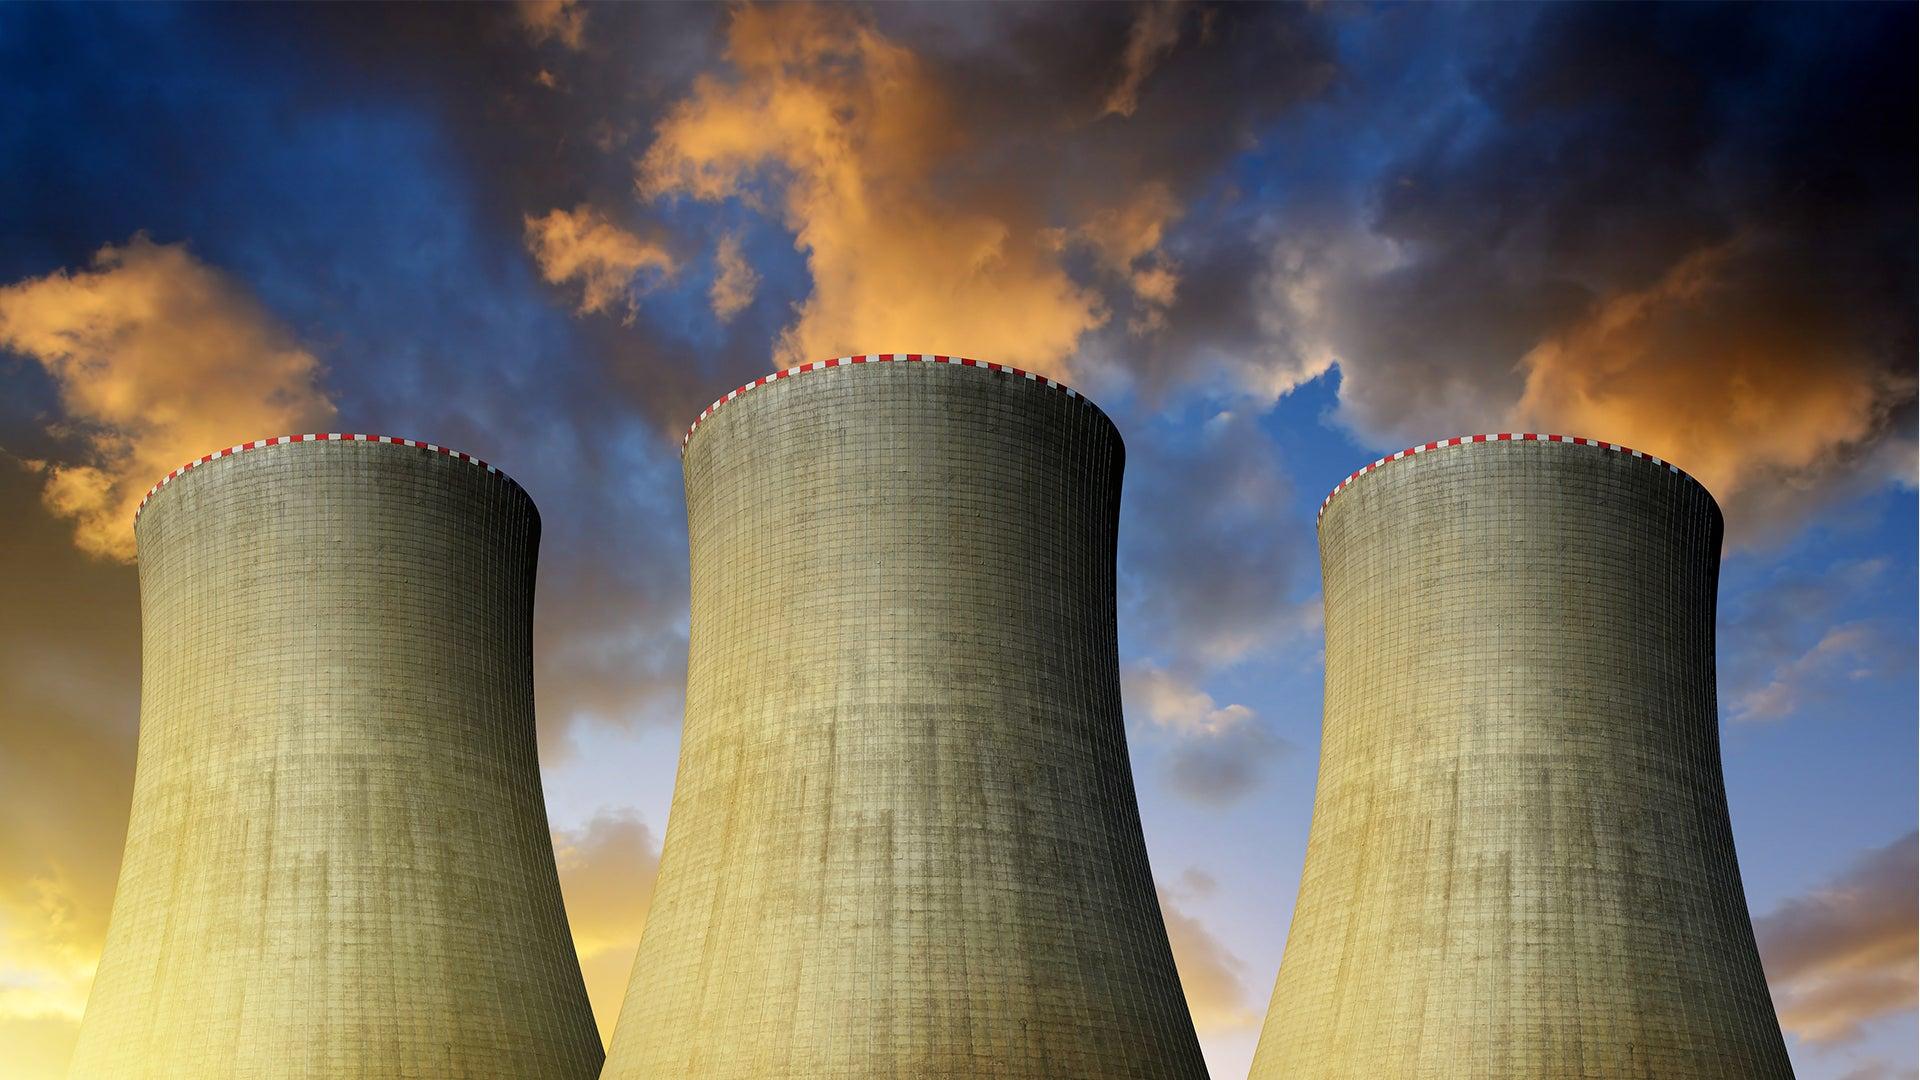 Three massive industrial chimneys expelling fumes